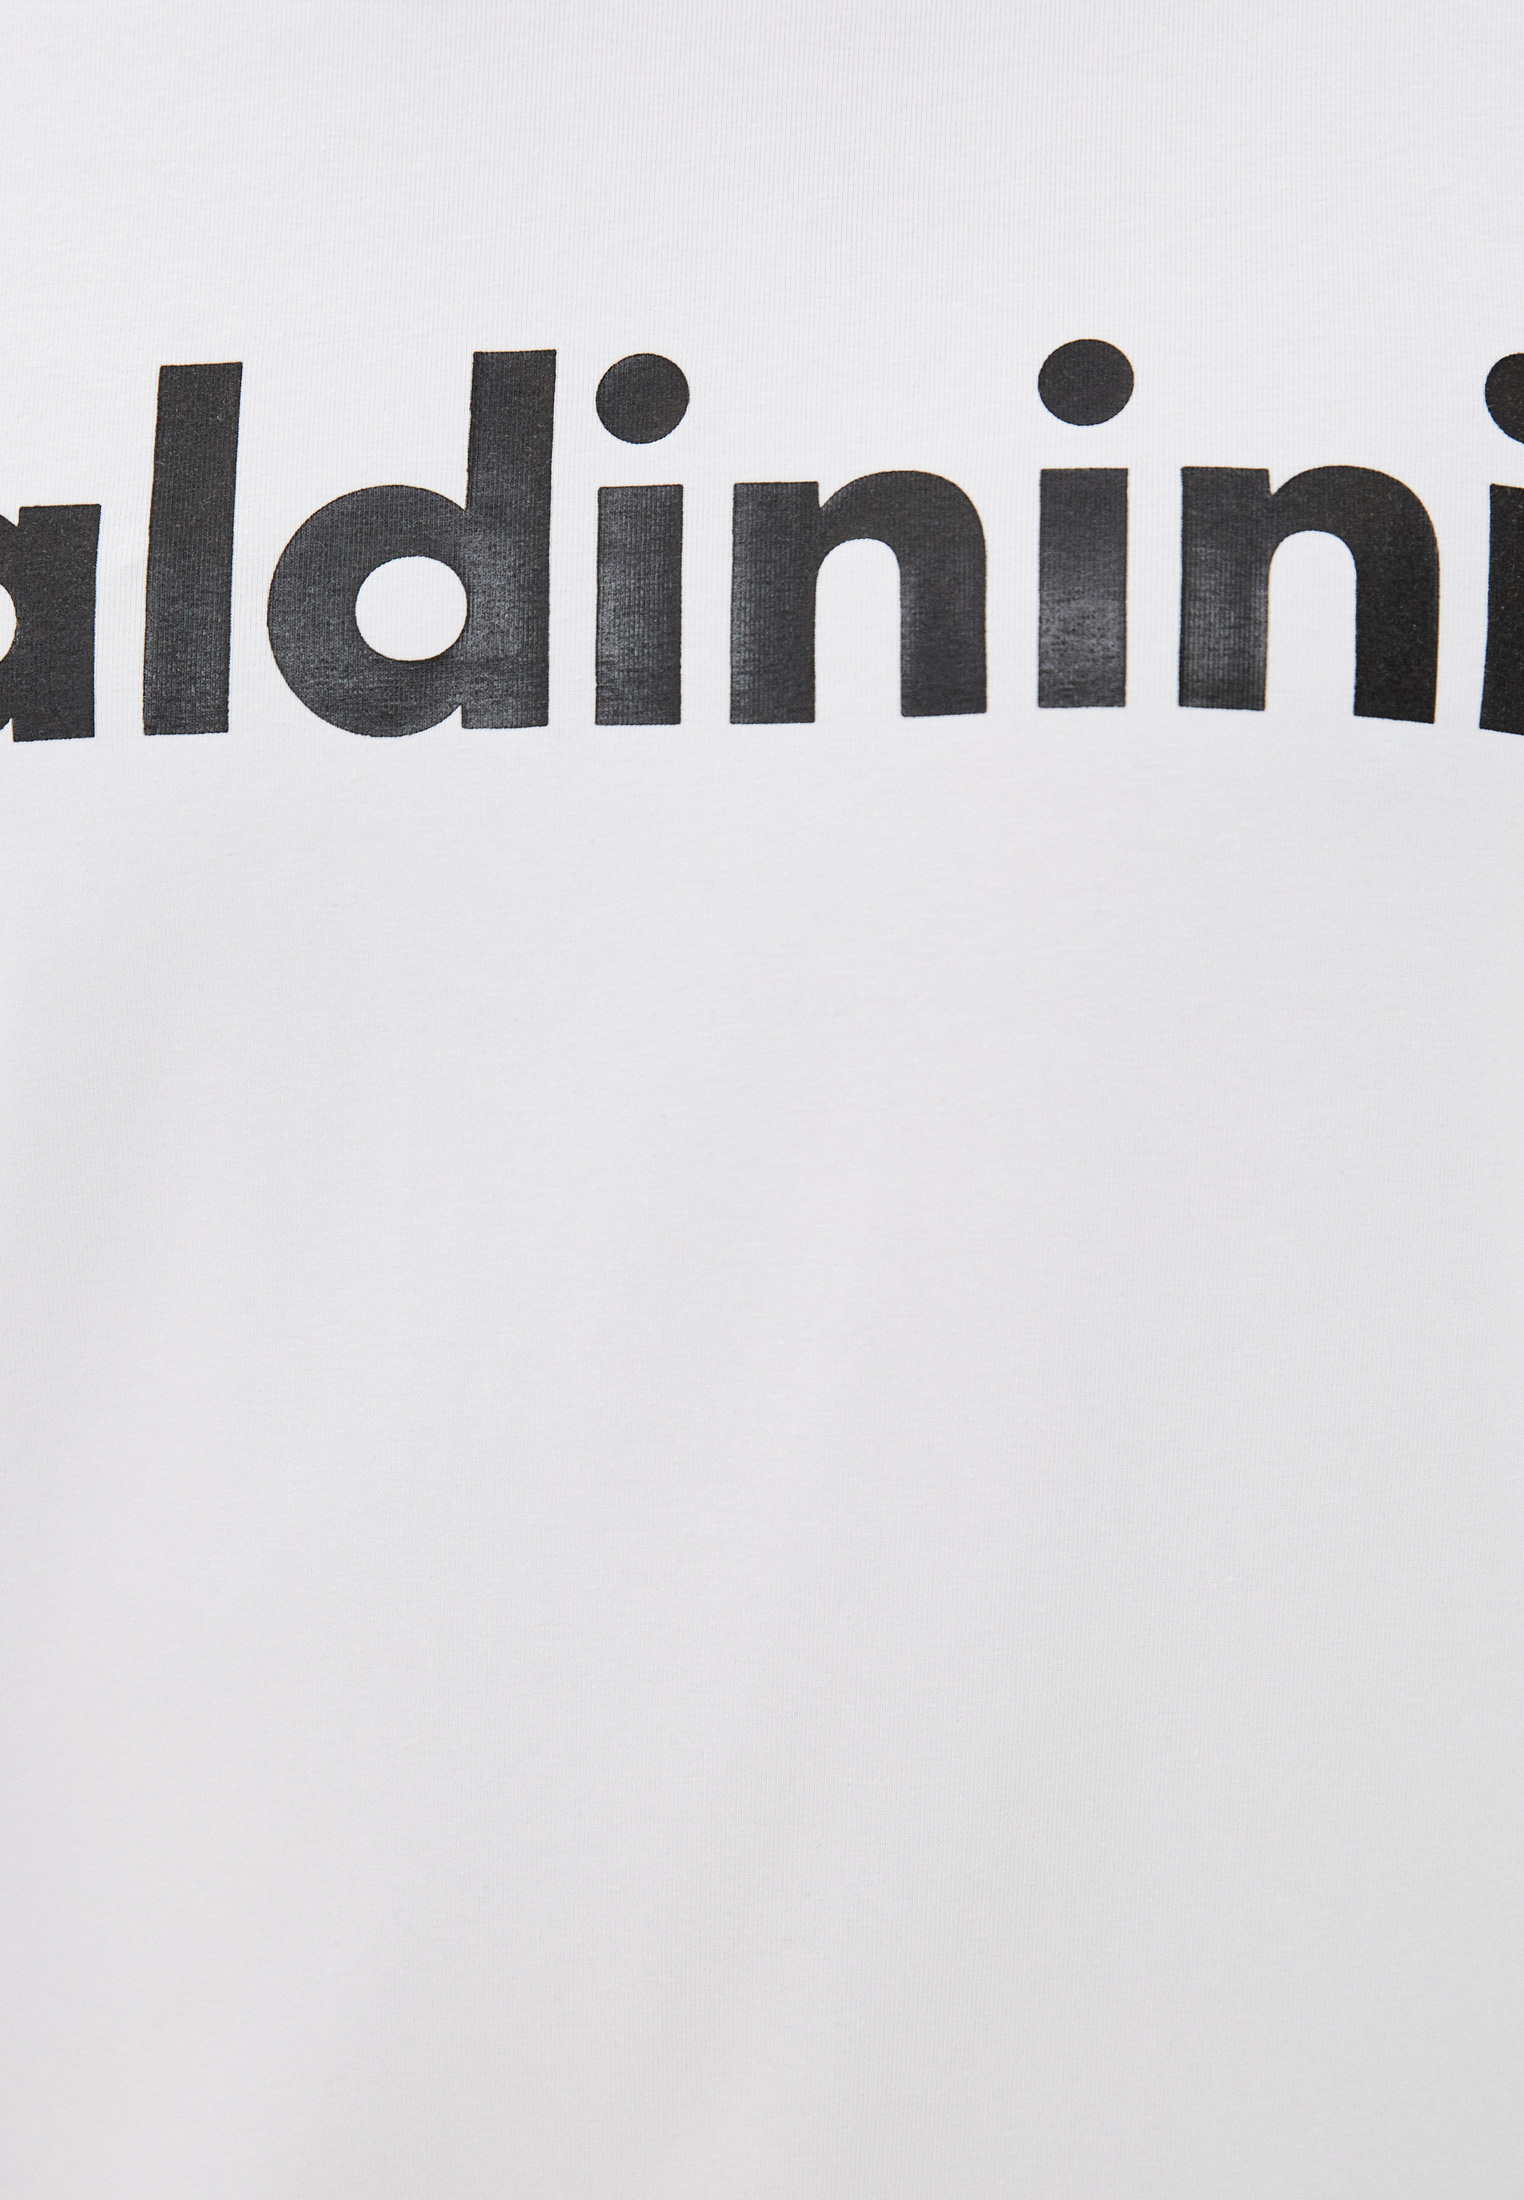 Мужская футболка Baldinini (Балдинини) TSU03: изображение 5